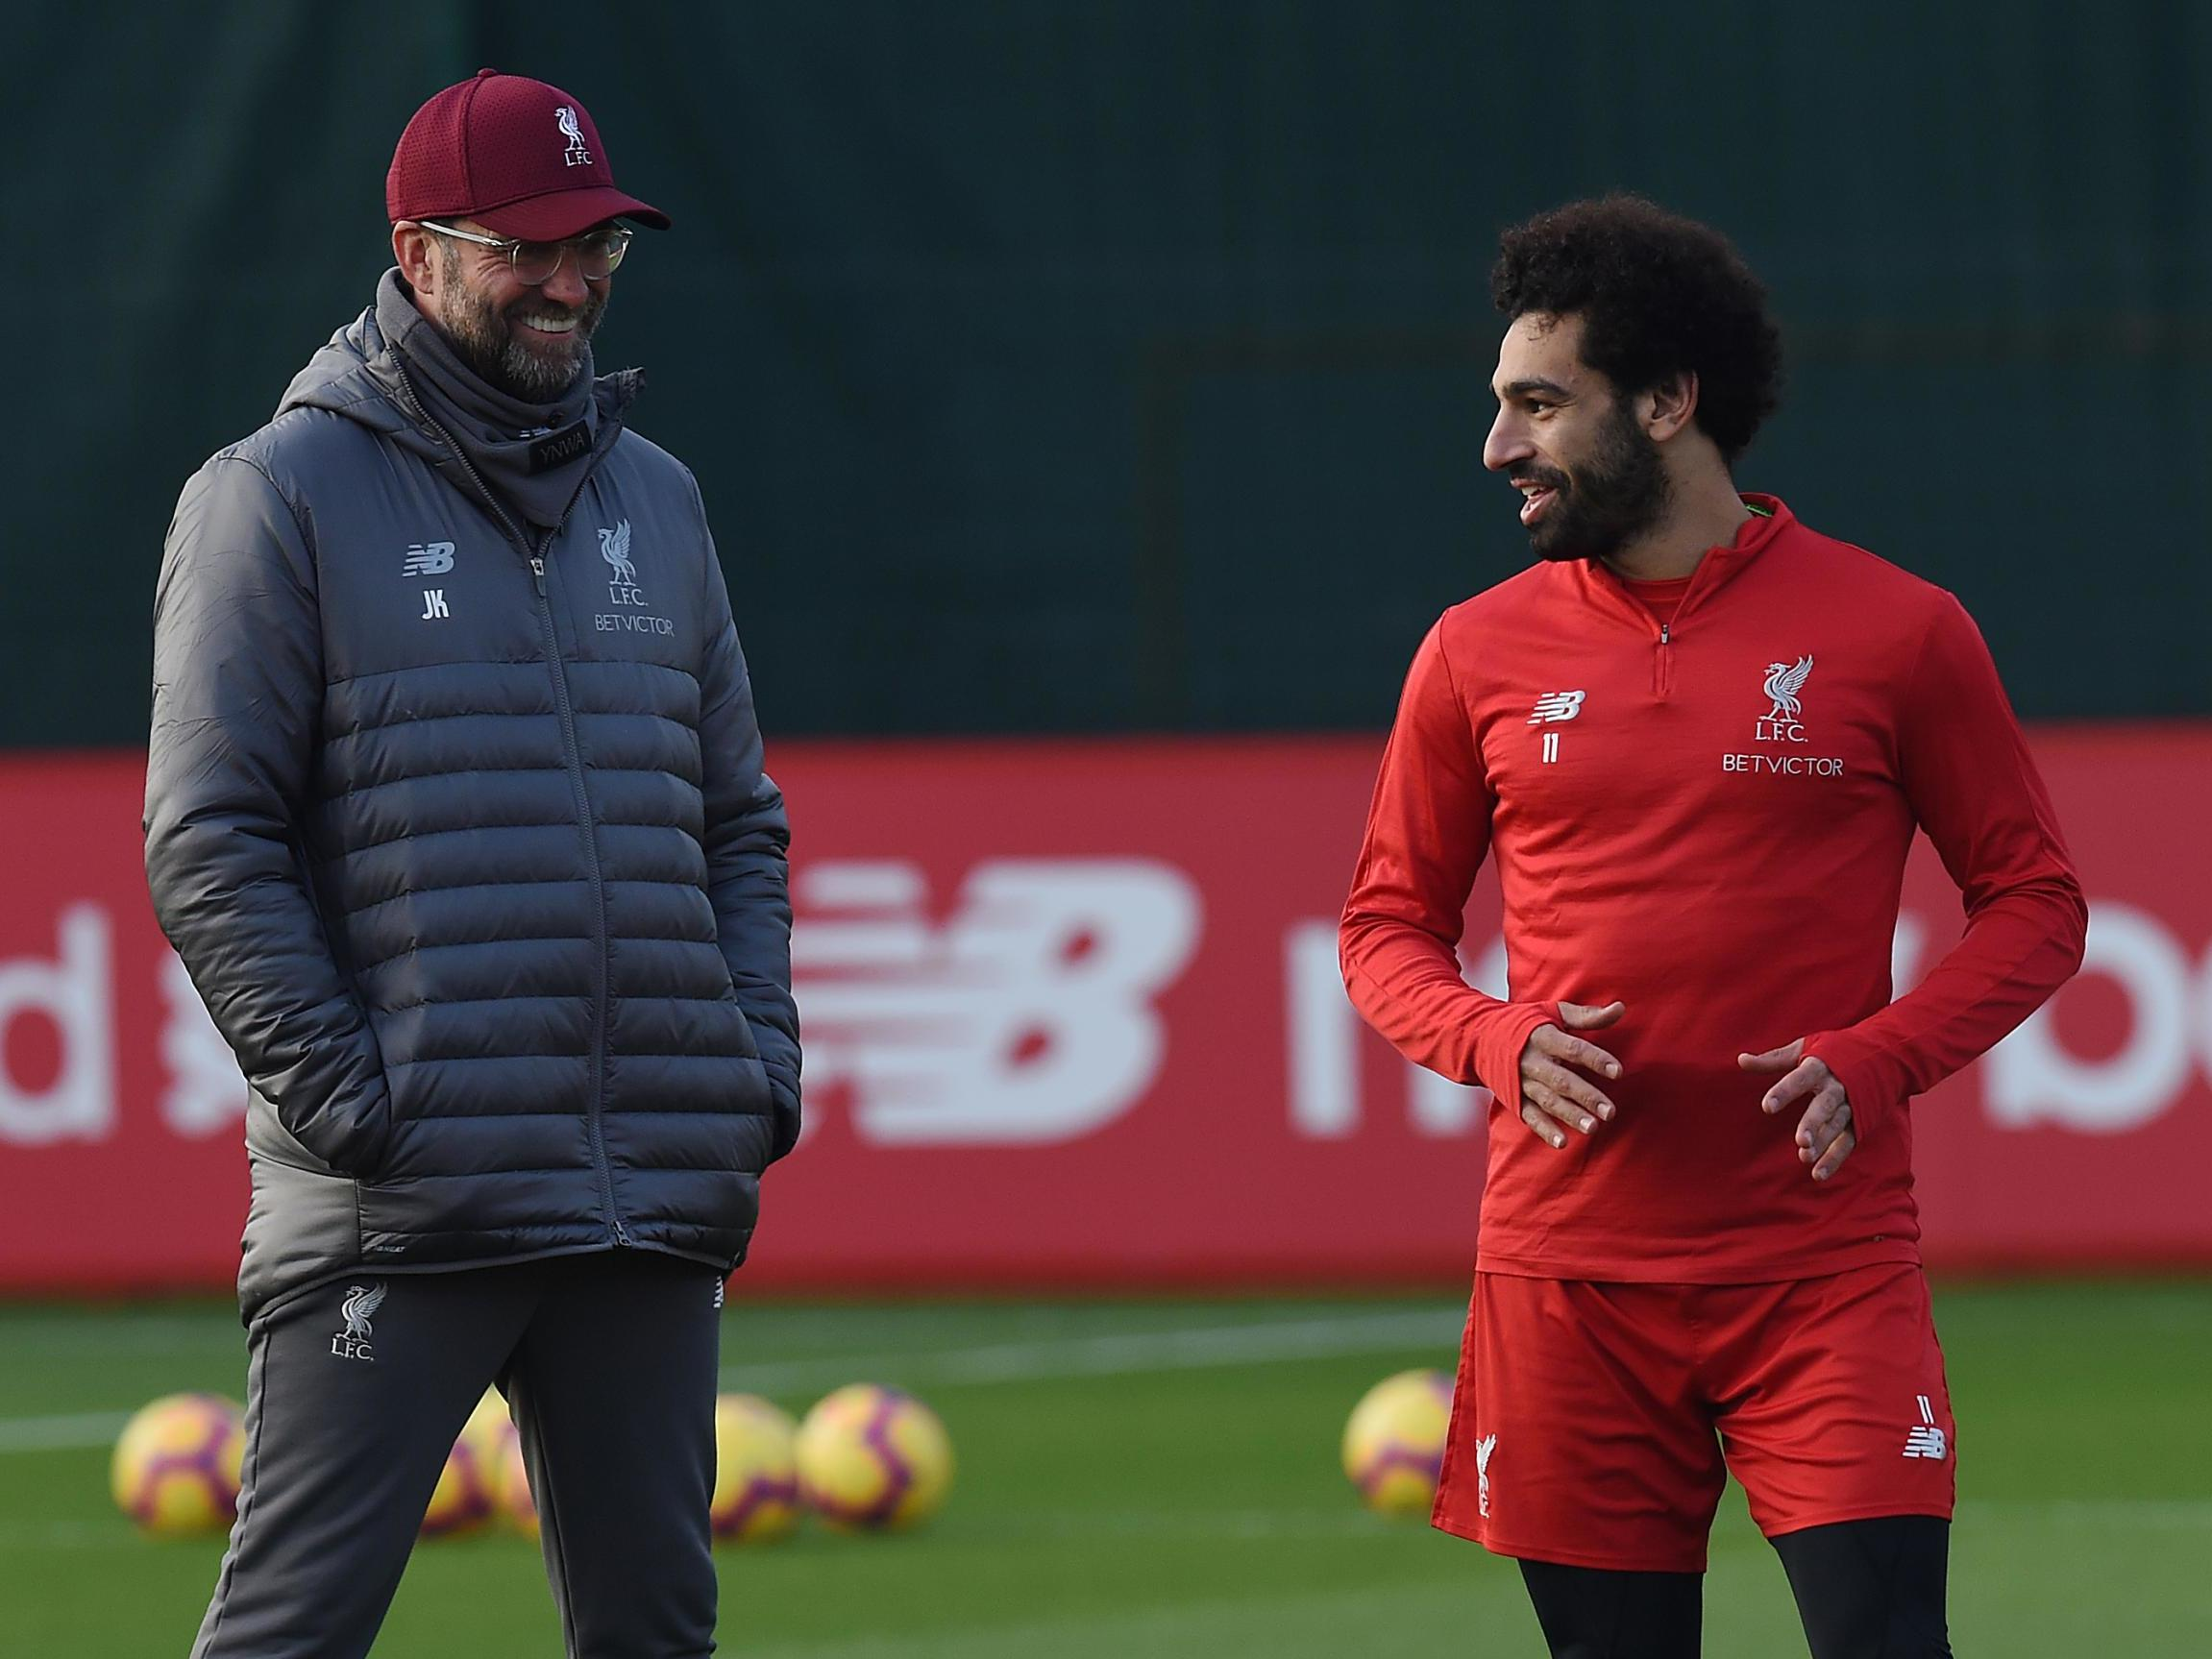 Liverpool news: Jurgen Klopp on how Mohamed Salah can rediscover his goalscoring form